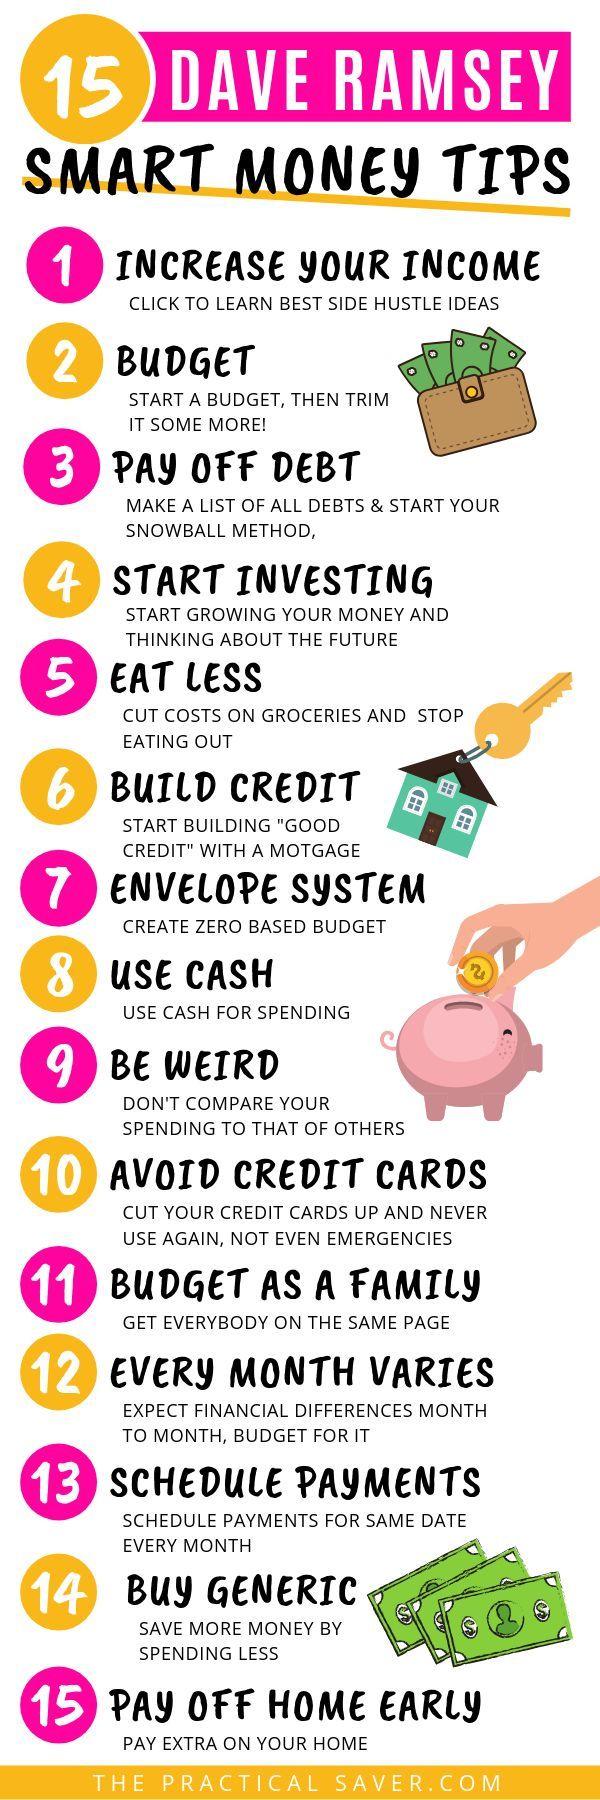 Dave Ramsey Tips: 15 Best Smart Money Tips – #Dave…